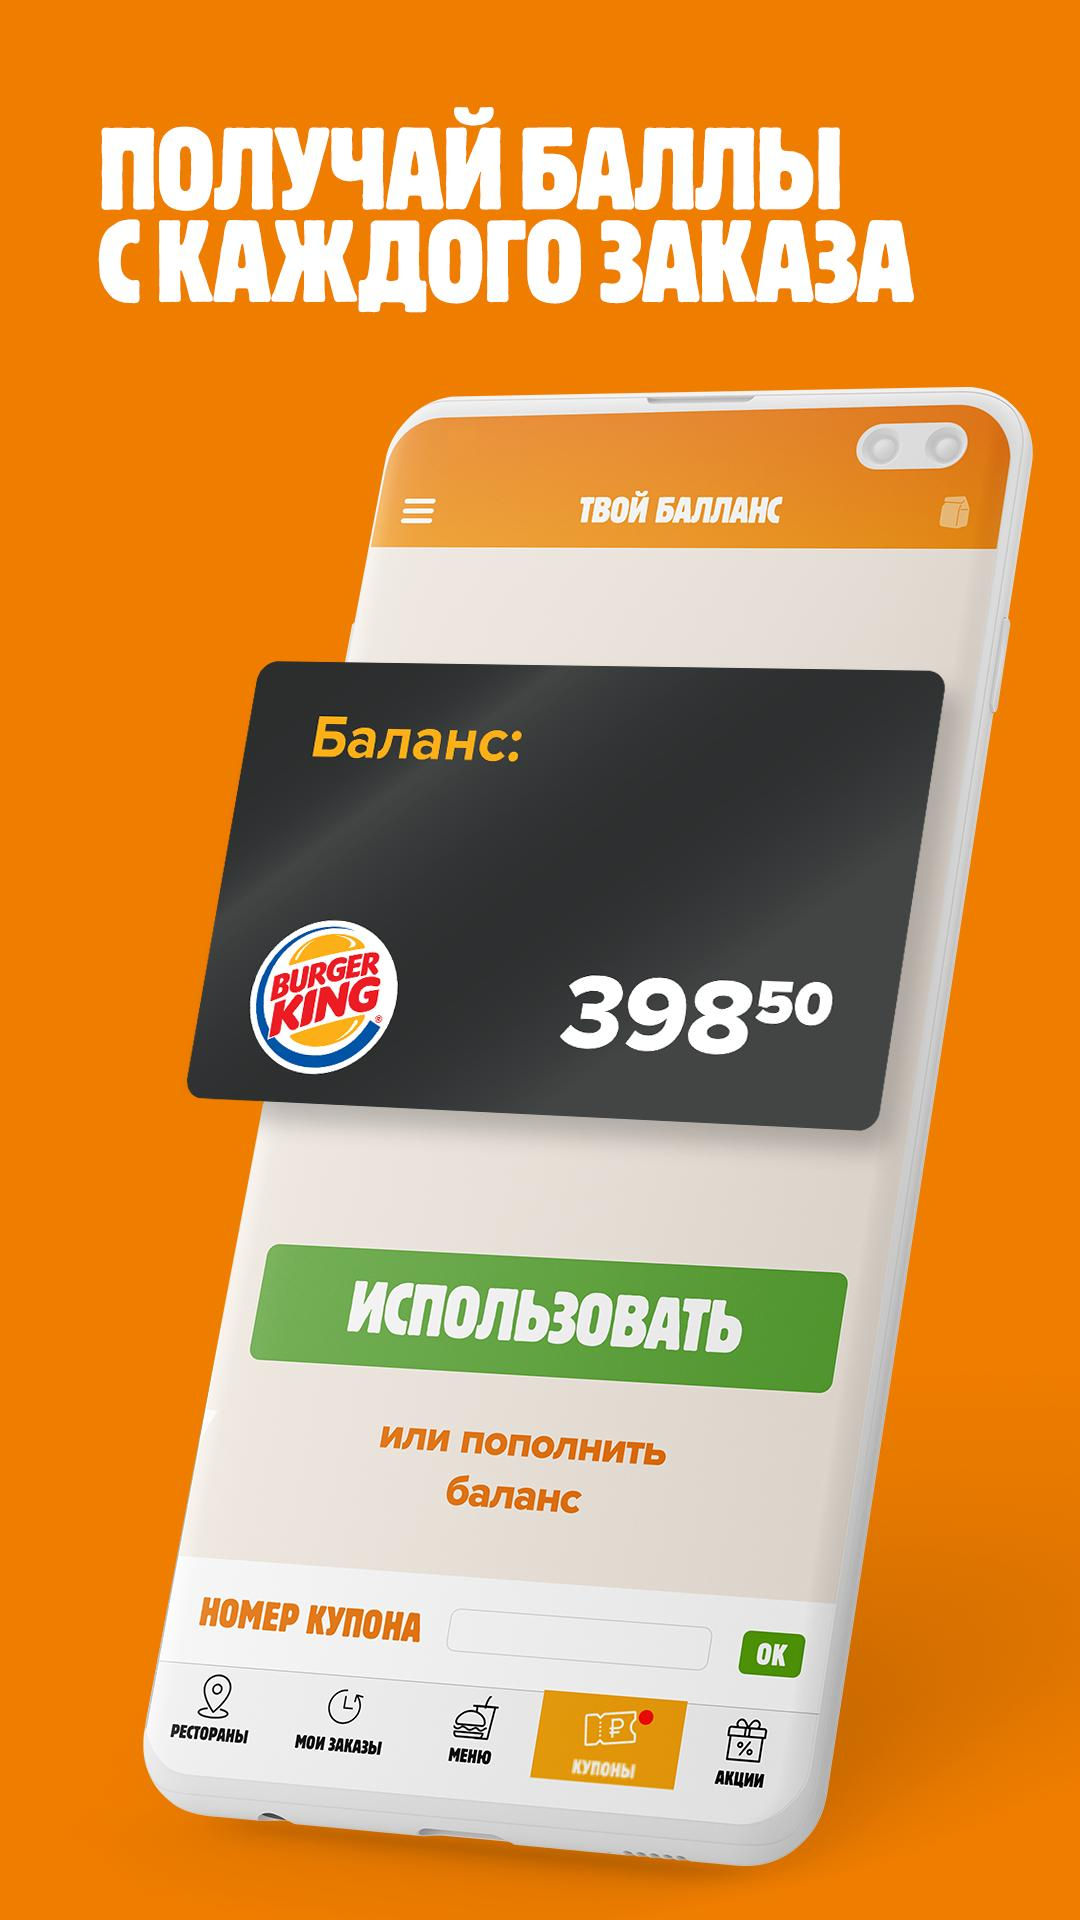 БУРГЕР КИНГ - 100 руб. за первый заказ 6.0.3 Screenshot 5